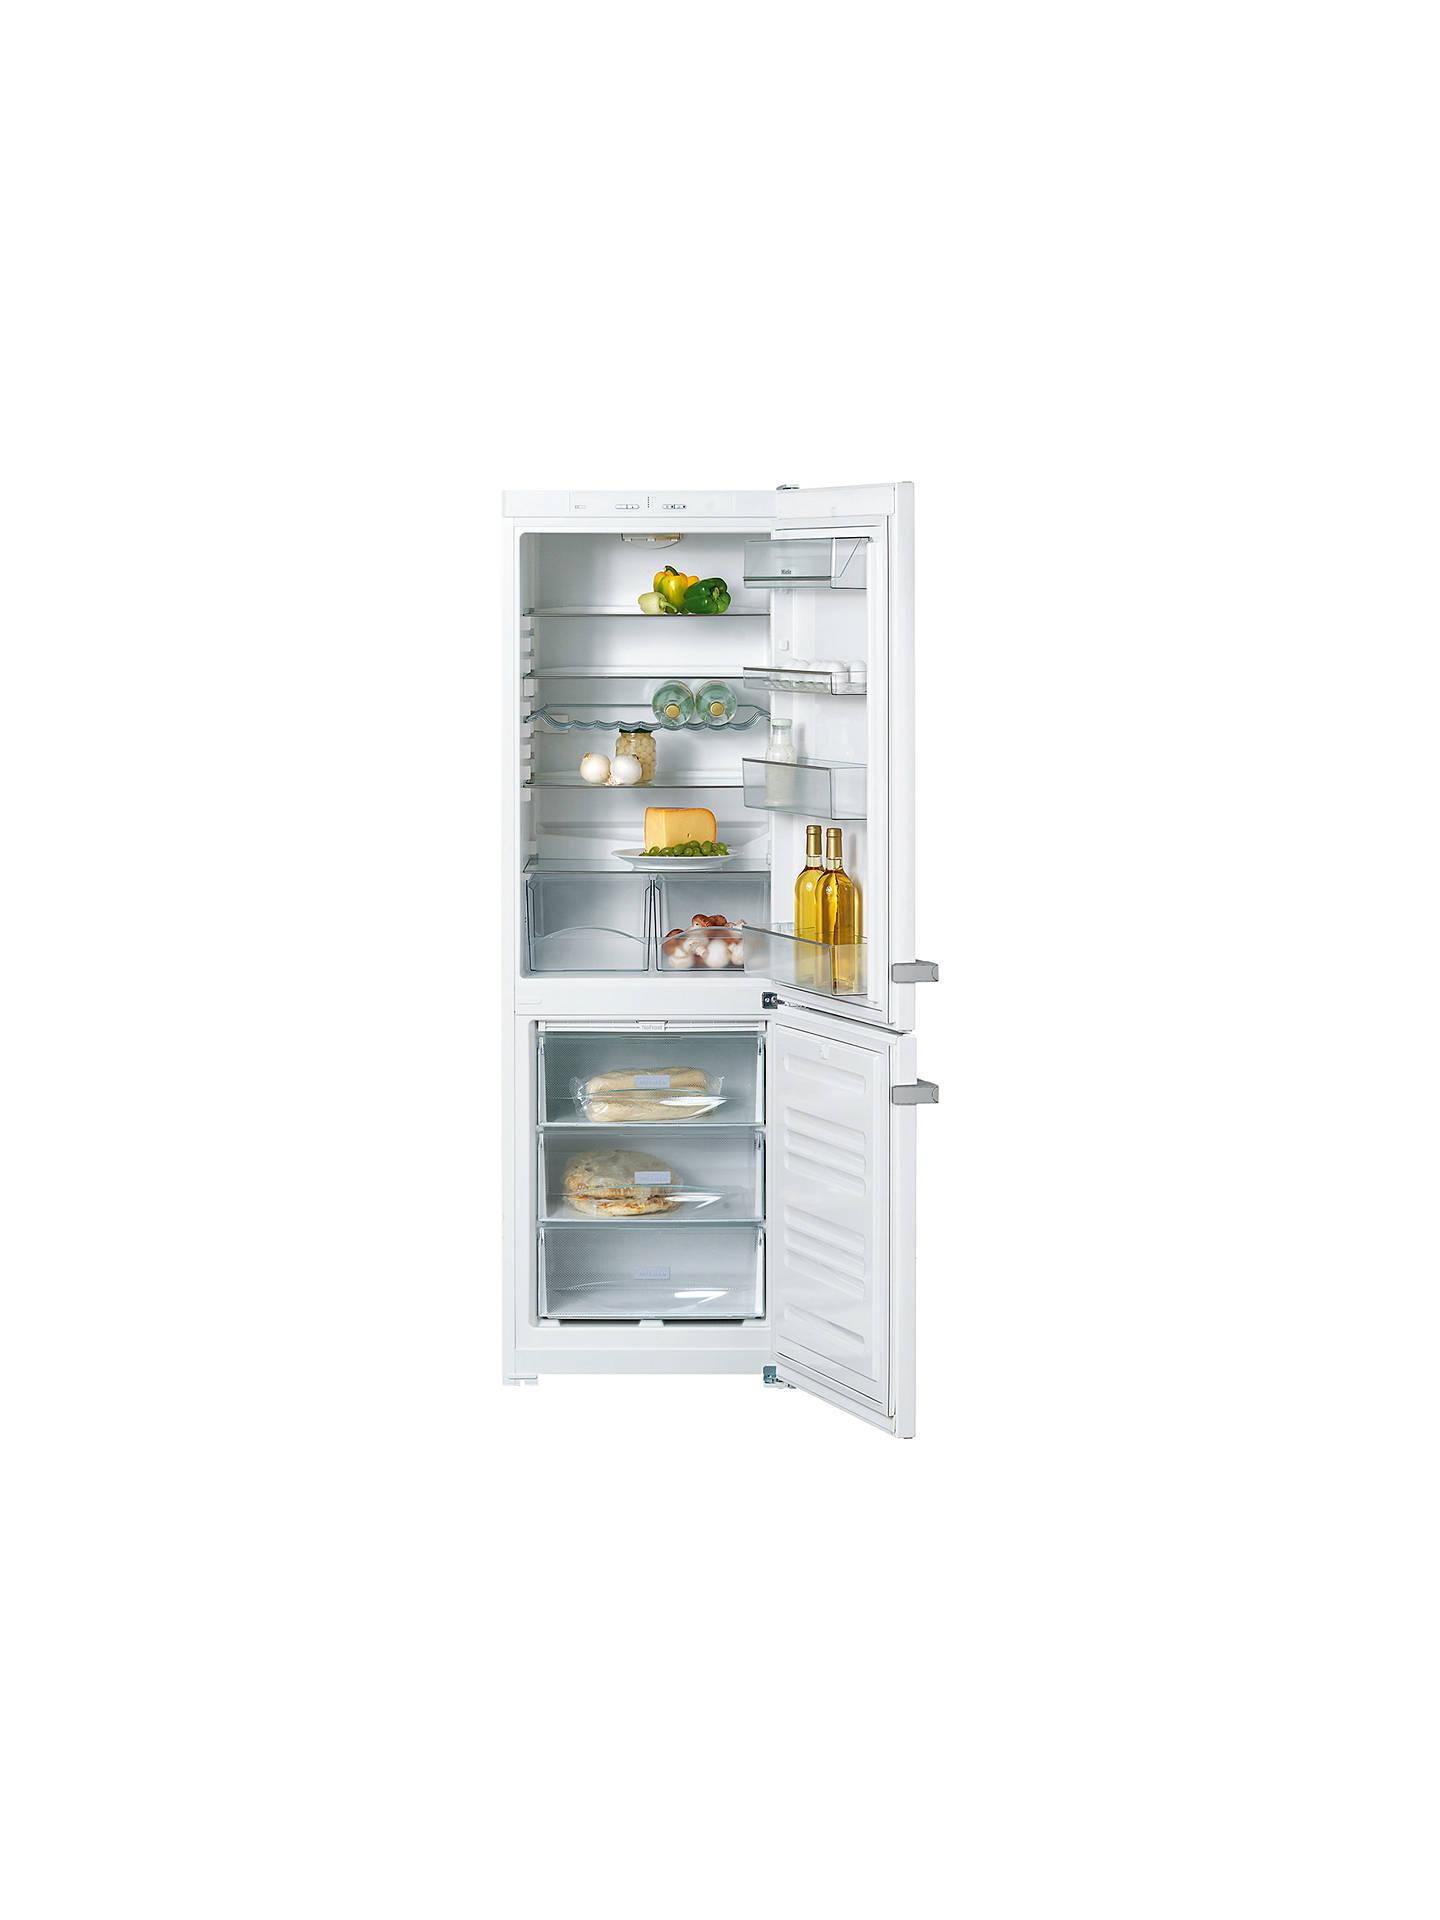 Miele kdn12823s 1 fridge freezer white at john lewis partners for John lewis home design service reviews